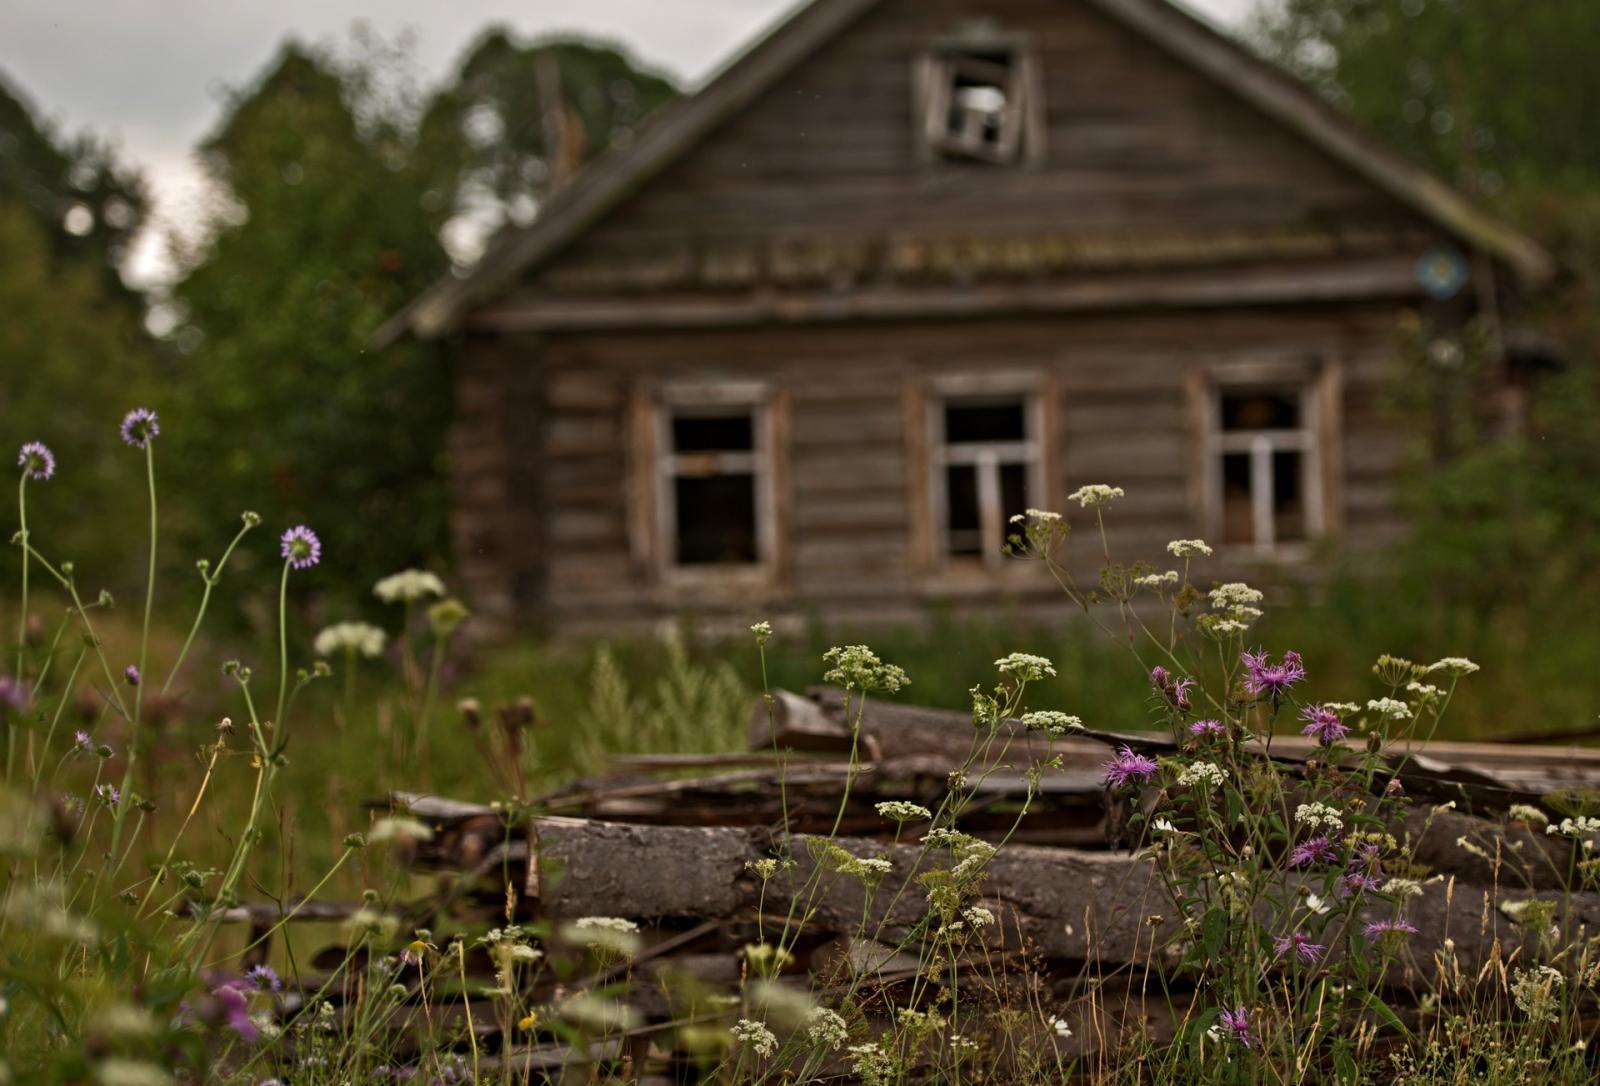 В Навлинском районе обнаружена деревня-призрак